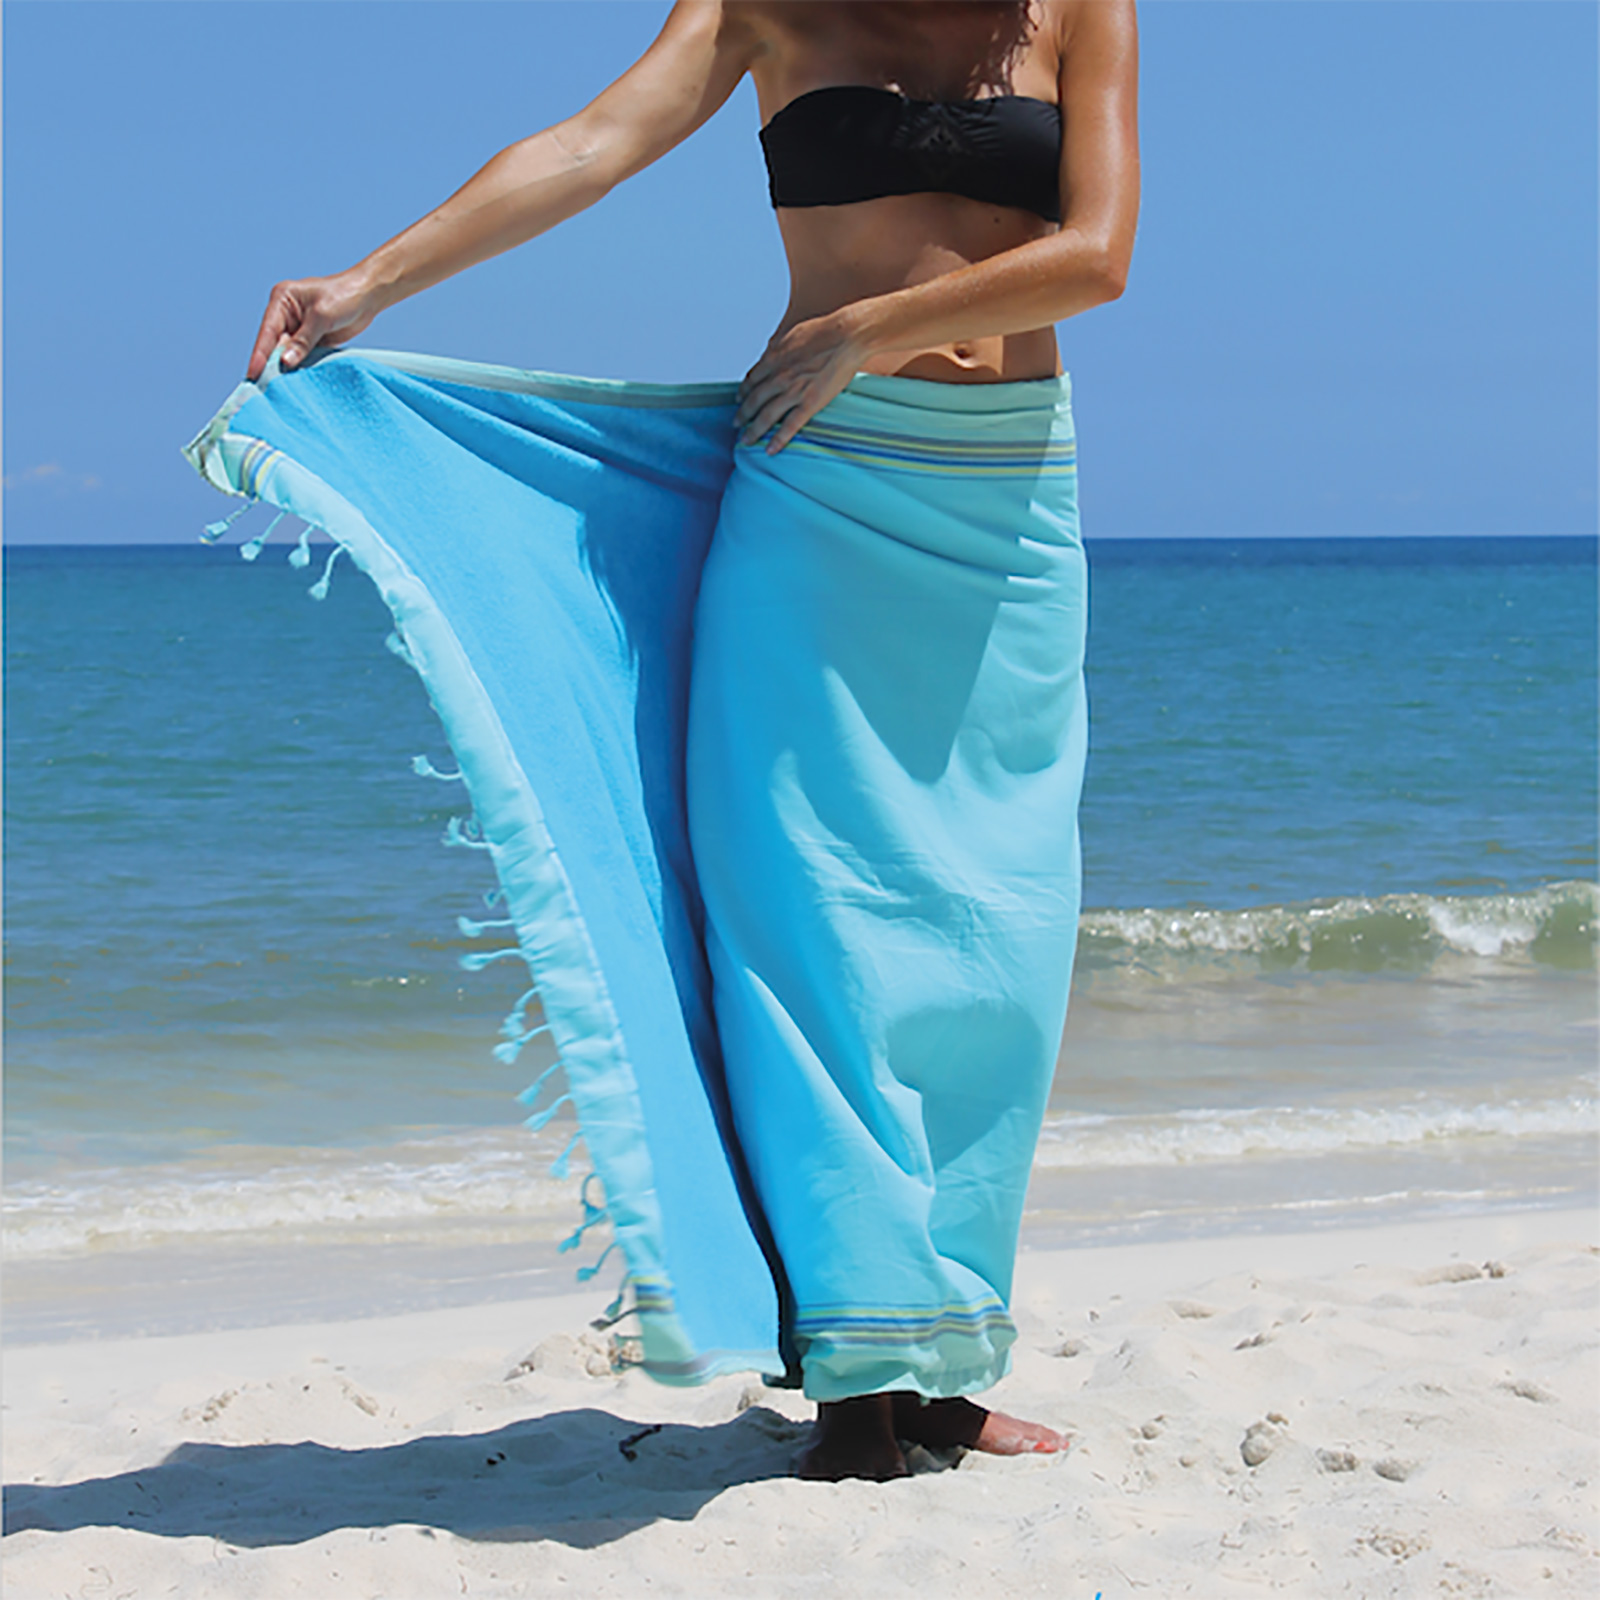 97528856f2a2 Toalla De Playa Y Pareo - Reversible Azul Cielo / Turquesa - Kikoy Blue  Lagoon